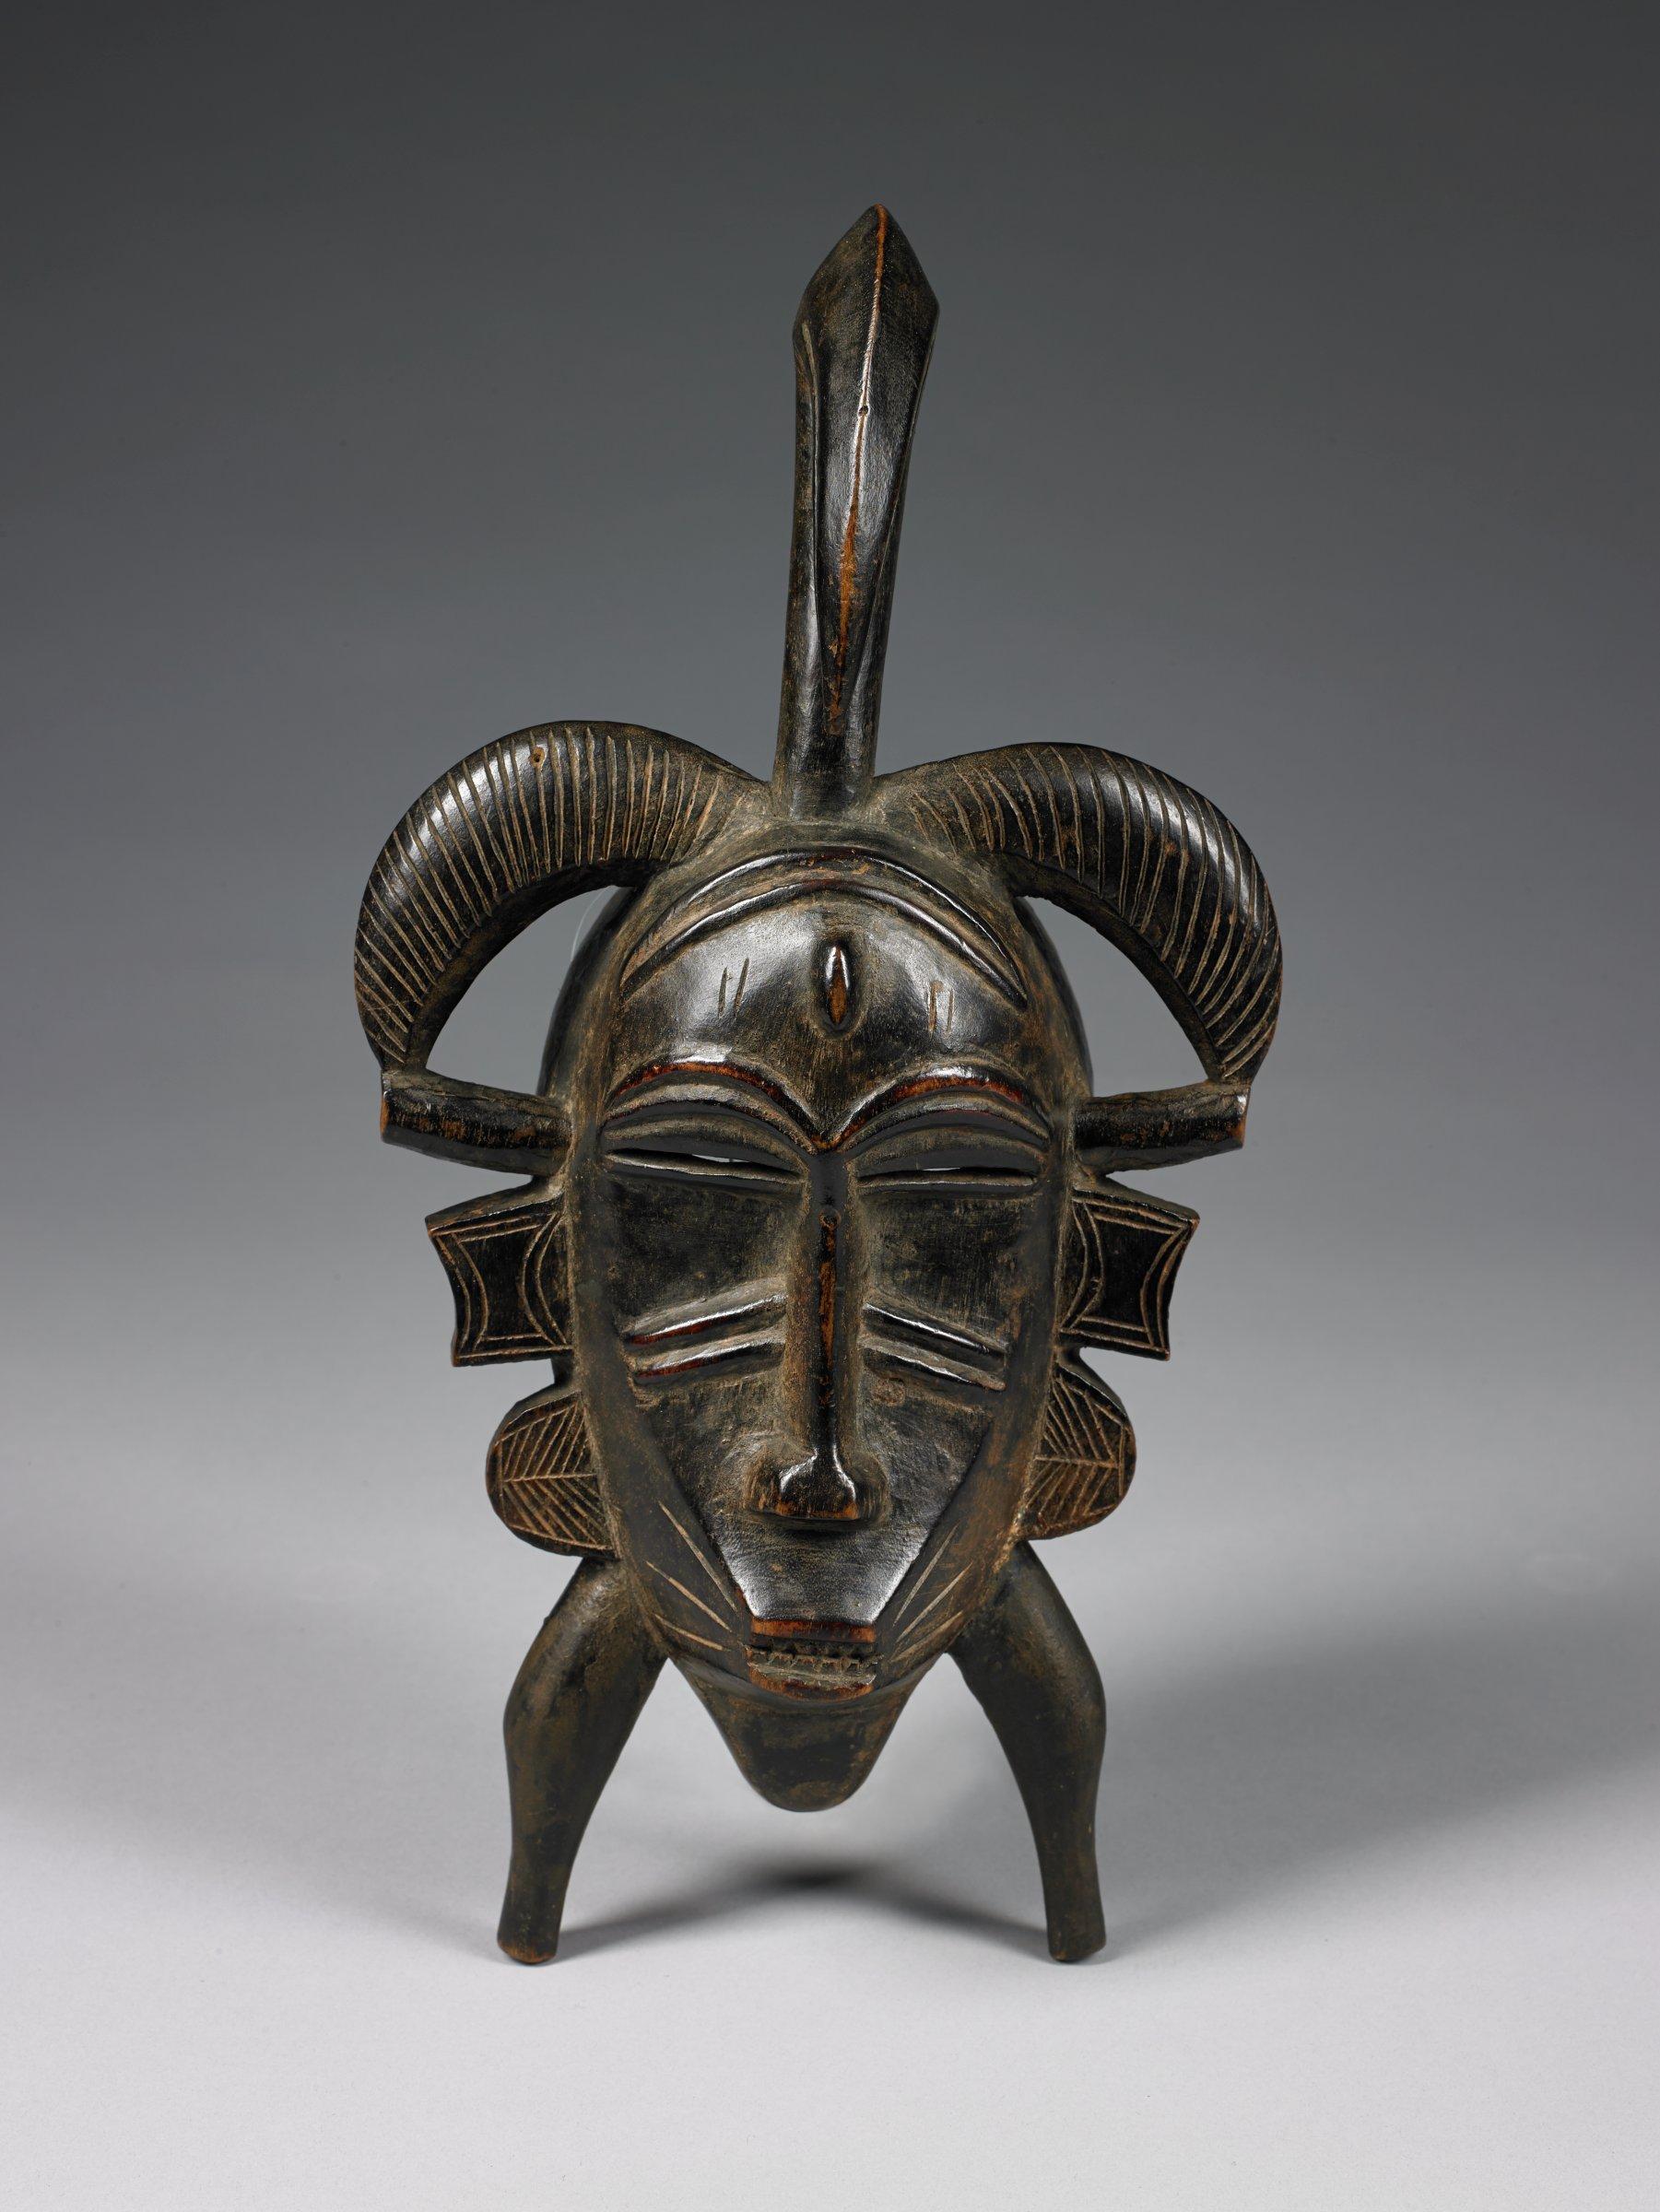 Mask (kpeliye e), Senufo people, Côte d'Ivoire, African, wood